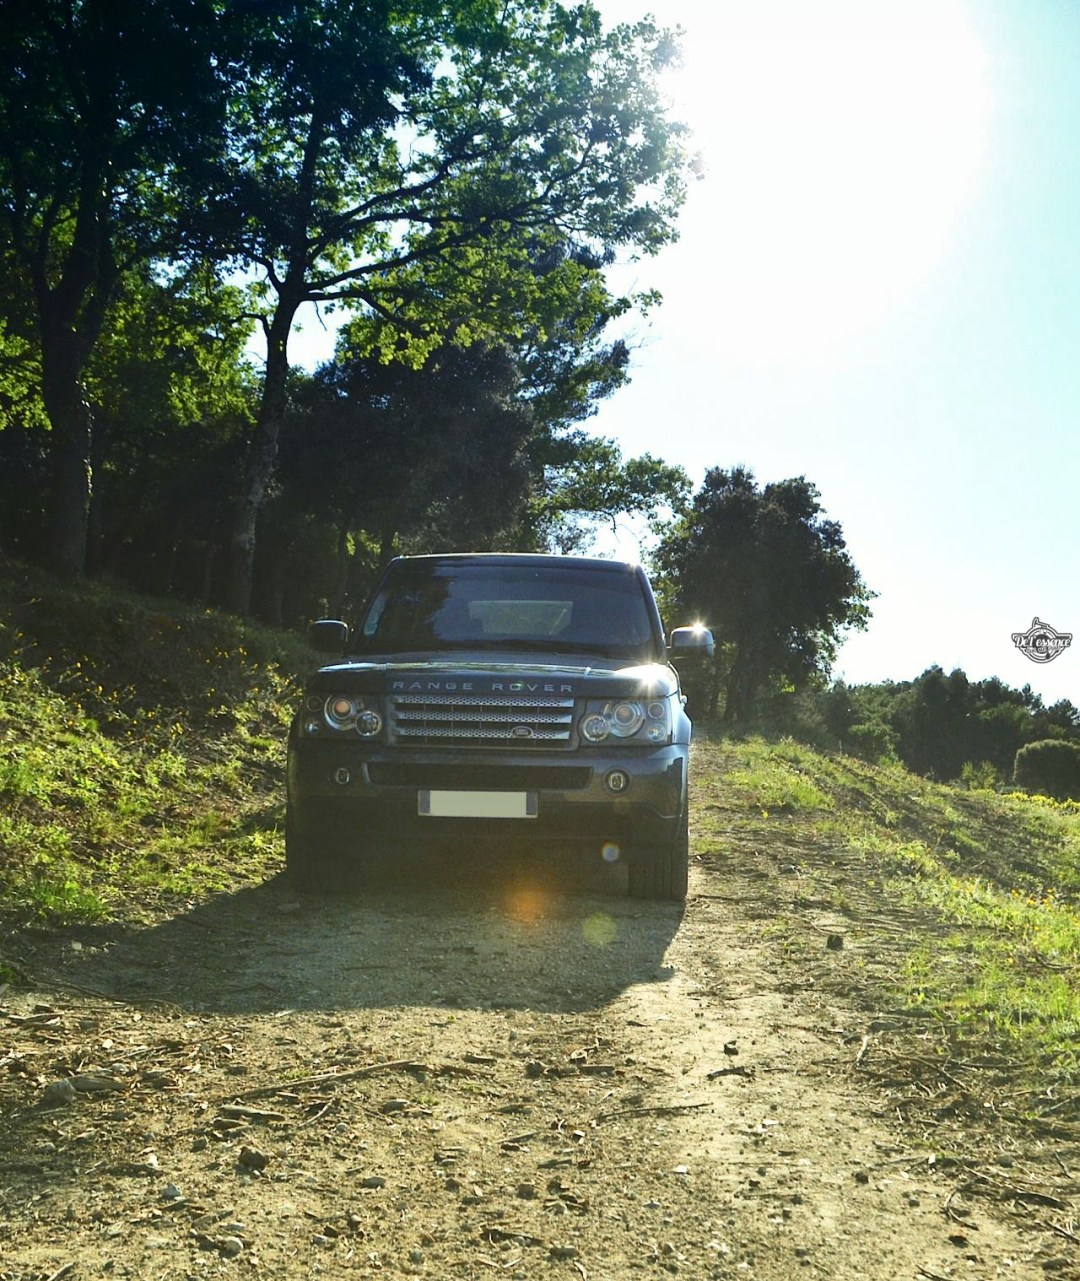 Range Rover Sport V8 Supercharged... Il est pas vert Hulk ?! 65